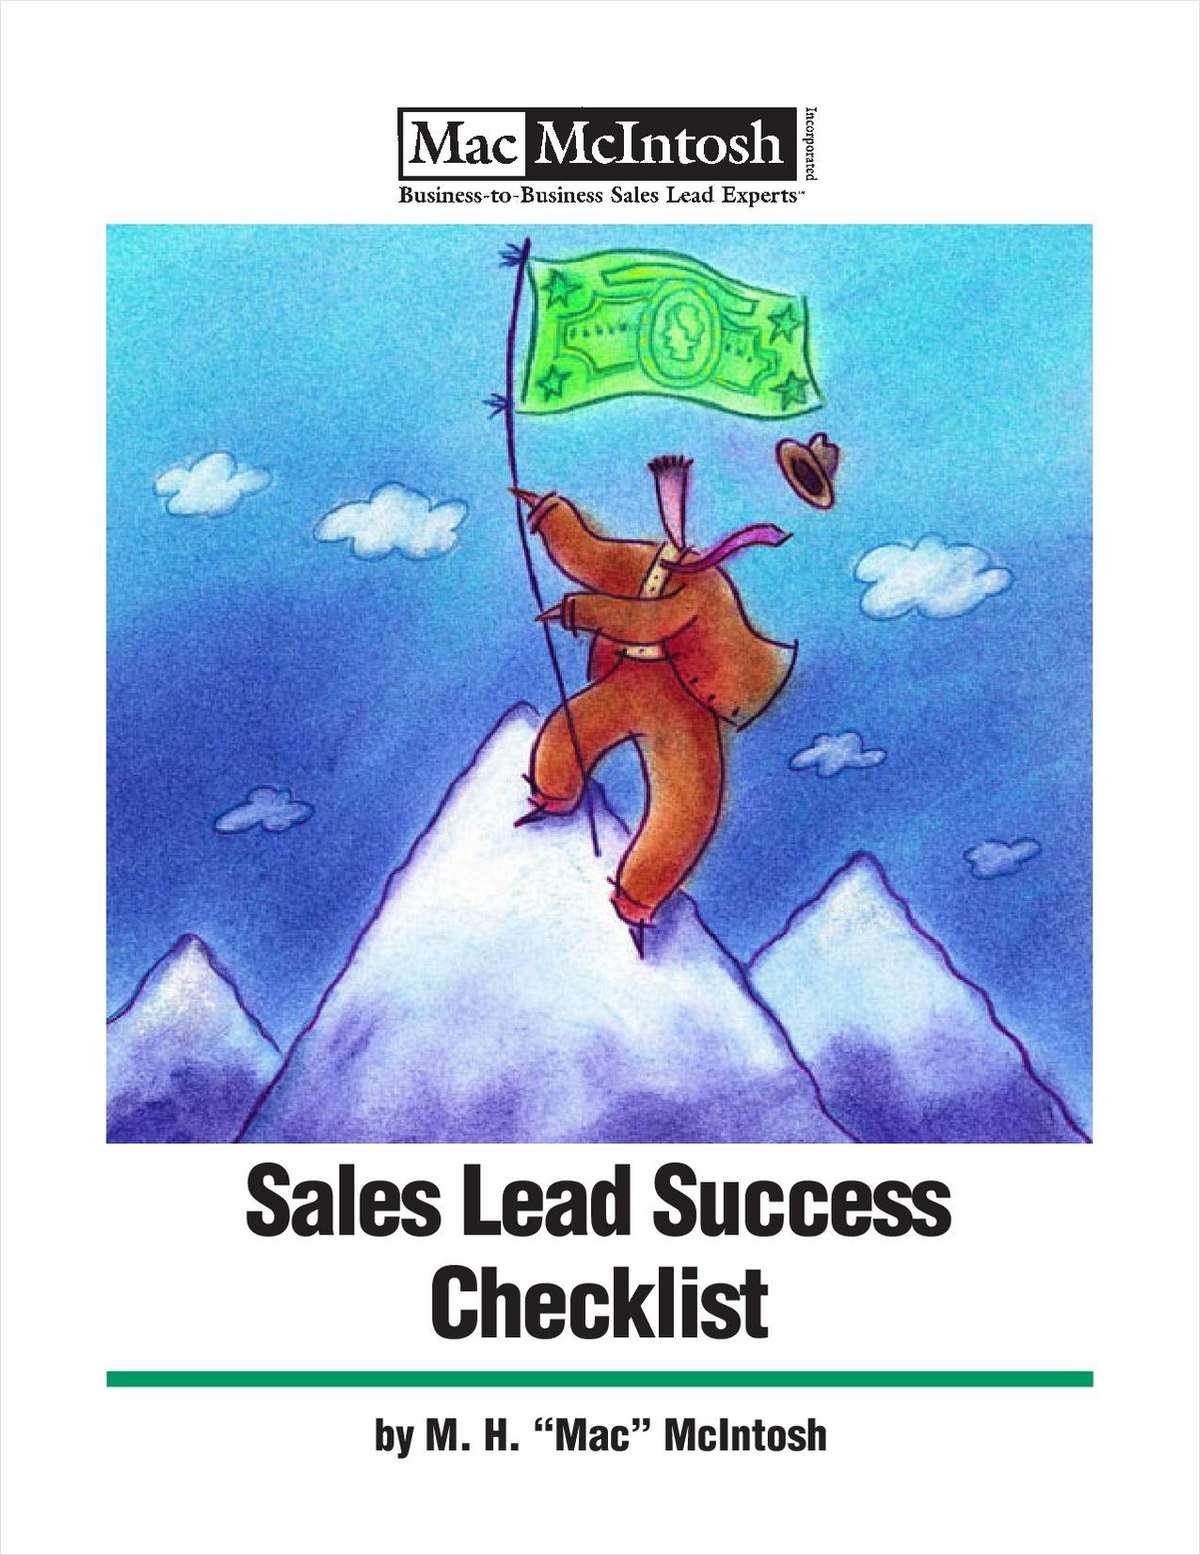 Technology B2B Sales Lead Success Checklist